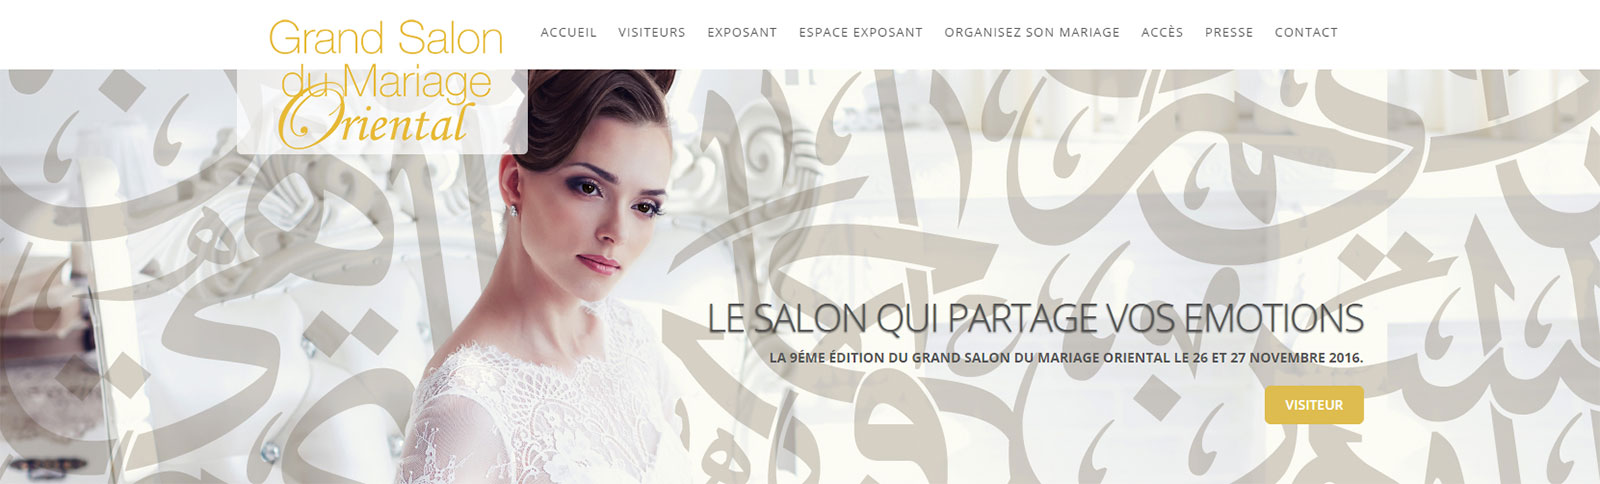 salon mariage oriental paris